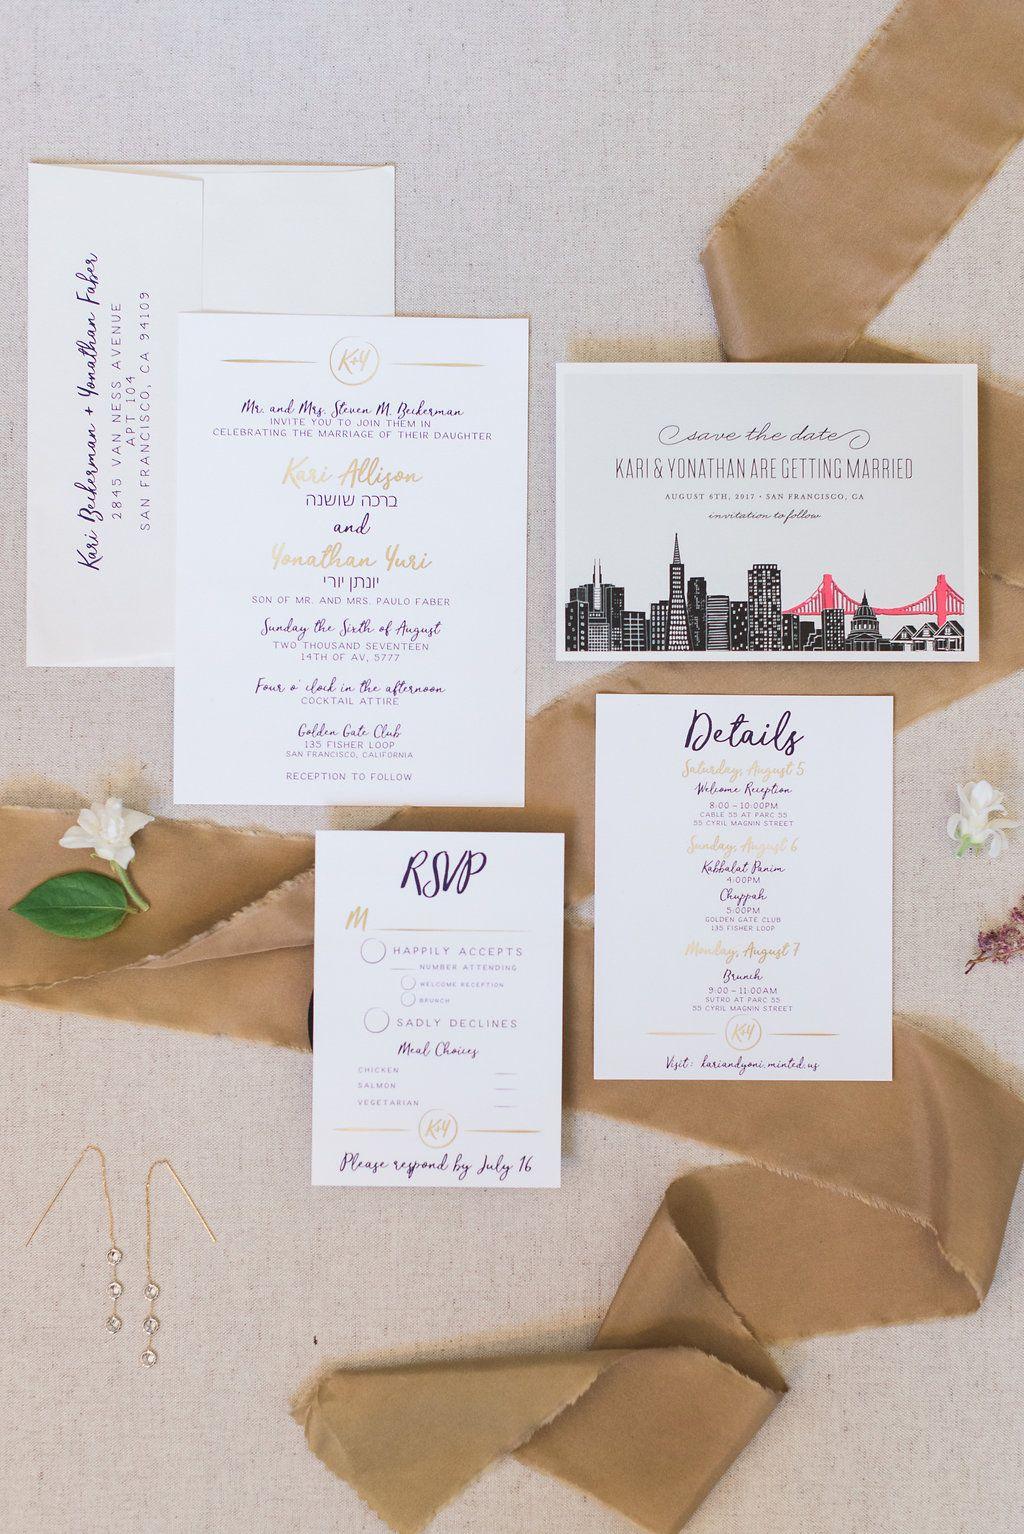 Custom wedding invitation suite by miss design berry wedding custom wedding invitation suite by miss design berry stopboris Choice Image